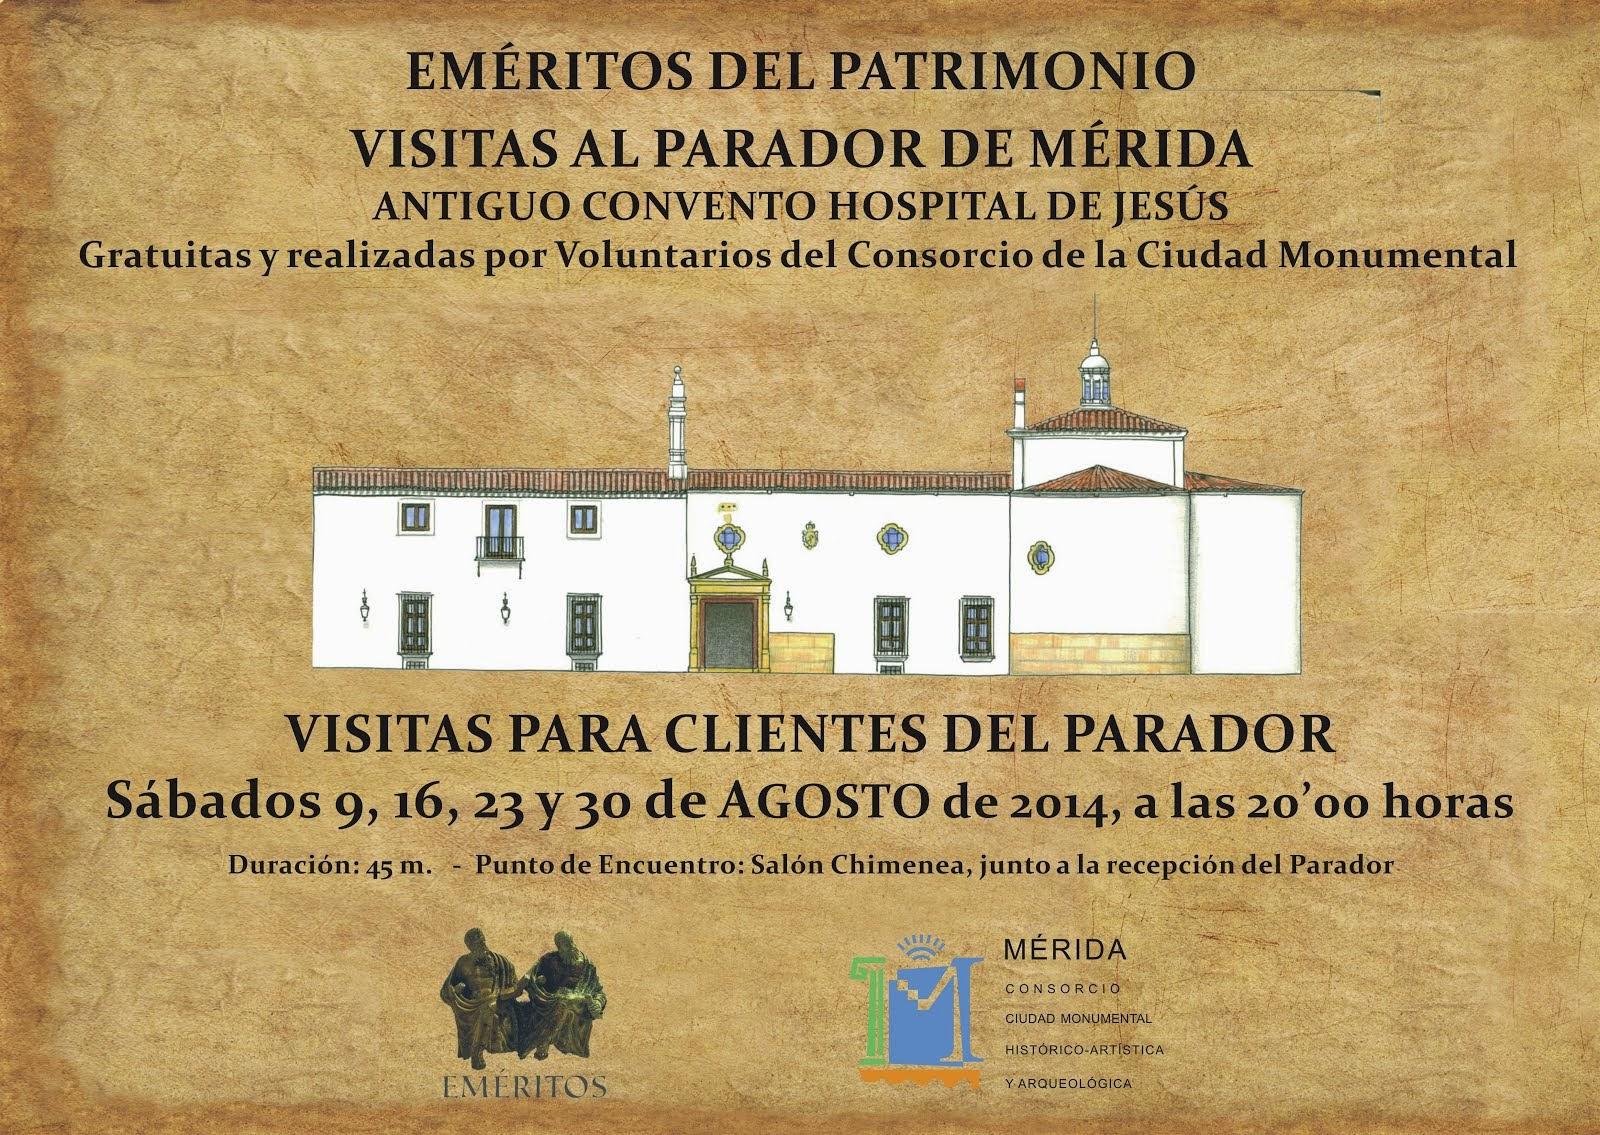 Parador - Convento de Jesús